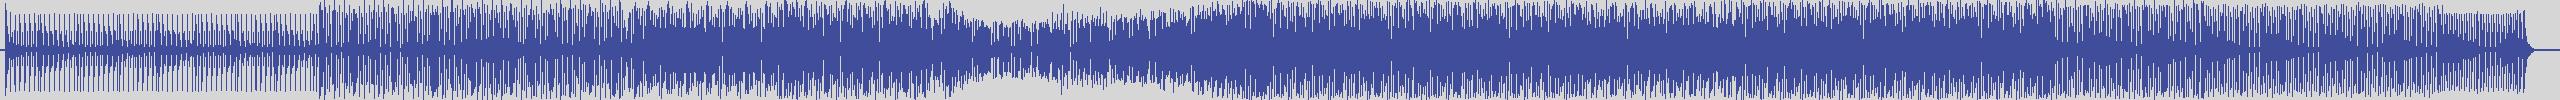 workin [WRK007] Black Caesar - Mirage [Banzigo Mix] audio wave form